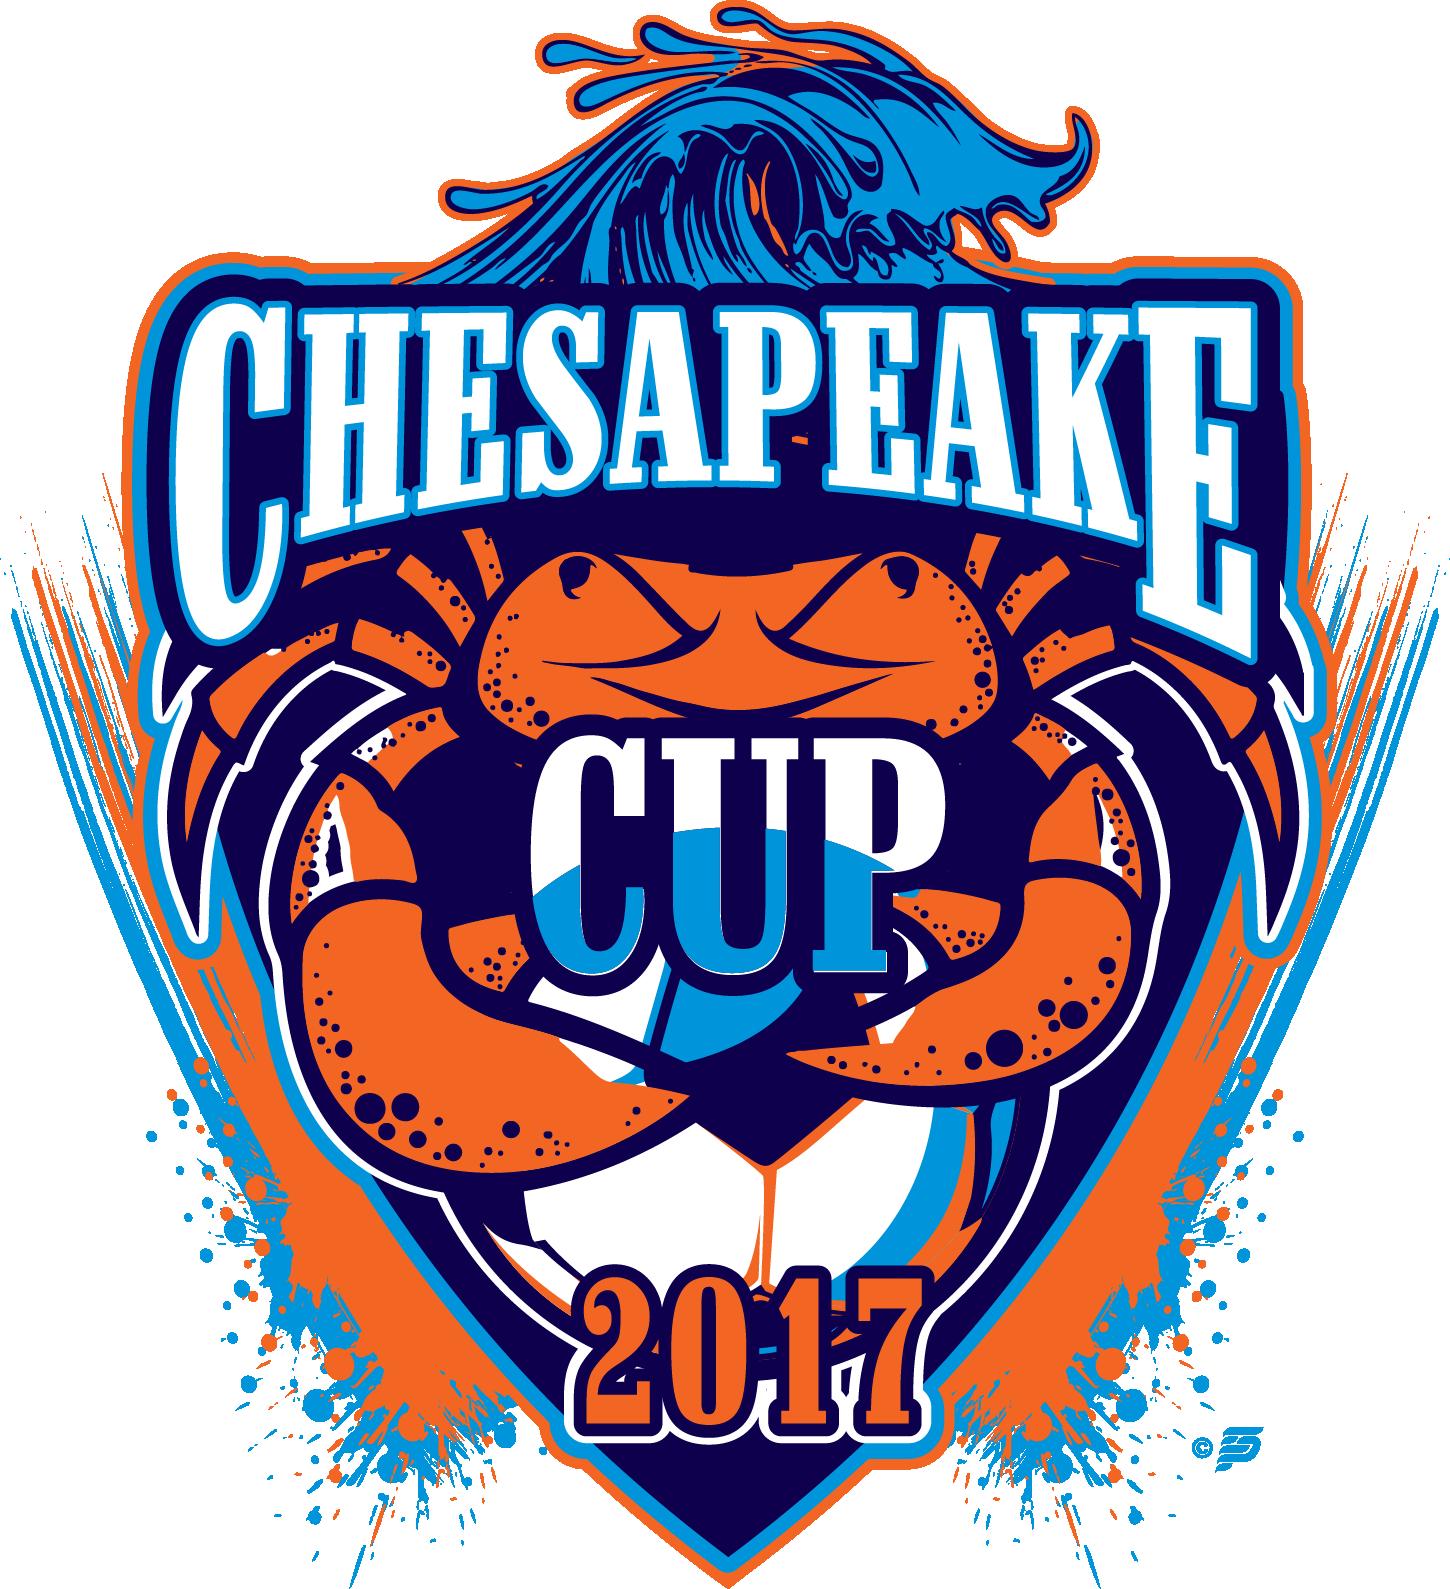 chesapeake-cup-logo